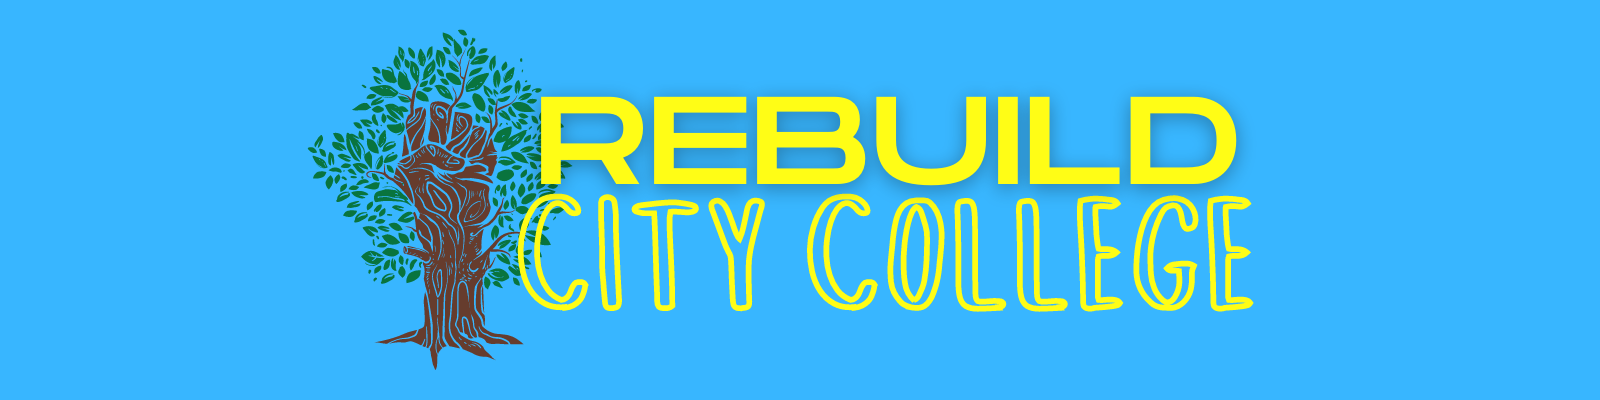 Rebuild_-_google_header